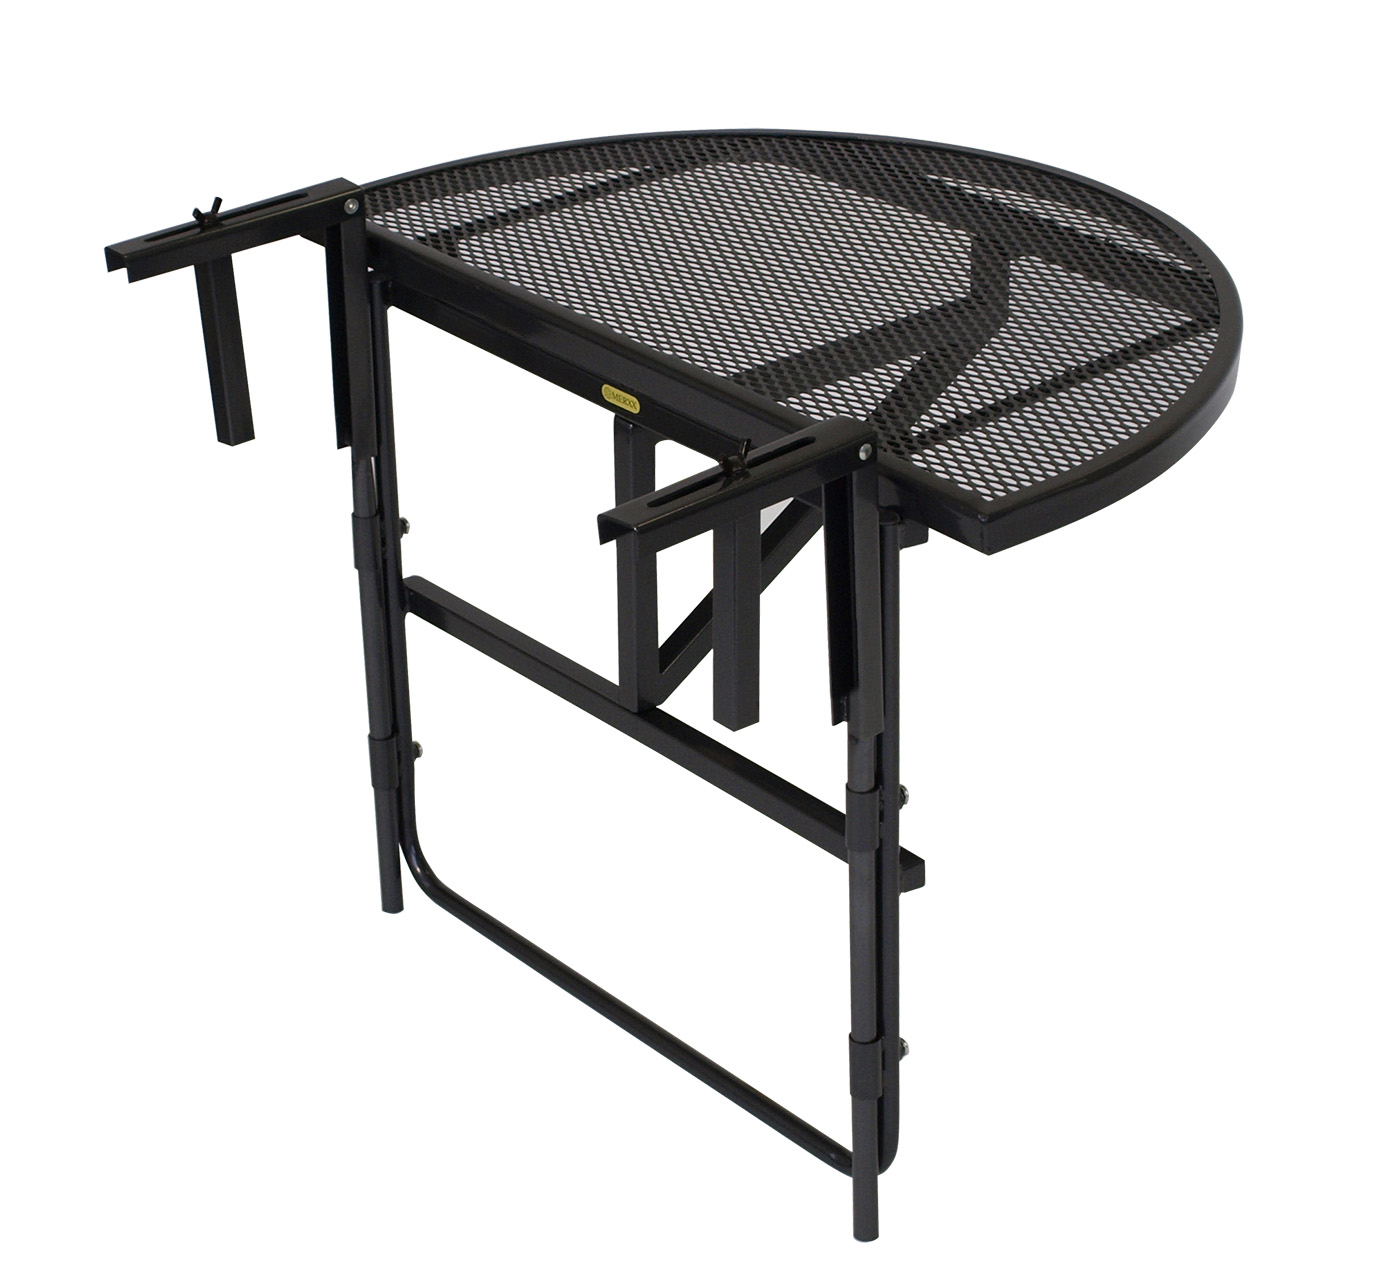 balkonh ngetisch balkontisch balkonklapptisch 70x42cm metall streckmetall grau ebay. Black Bedroom Furniture Sets. Home Design Ideas